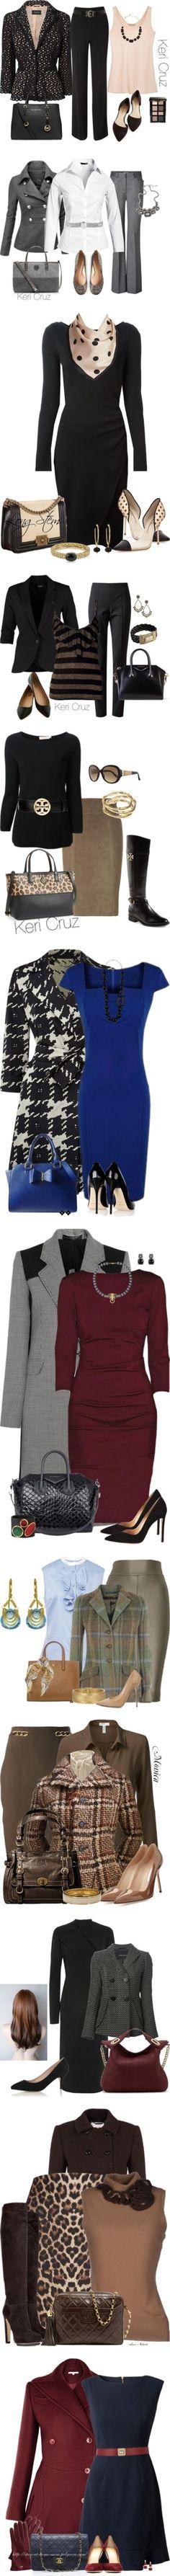 New Fashion Work Outfit Winter Michael Kors Ideas - Dresses/Cute Clothes - Punk Kids Winter Fashion, Kids Fashion, Fashion Ideas, Winter Outfits For Work, Outfit Winter, Executive Outfit, Professional Wardrobe, Punk, Michael Kors